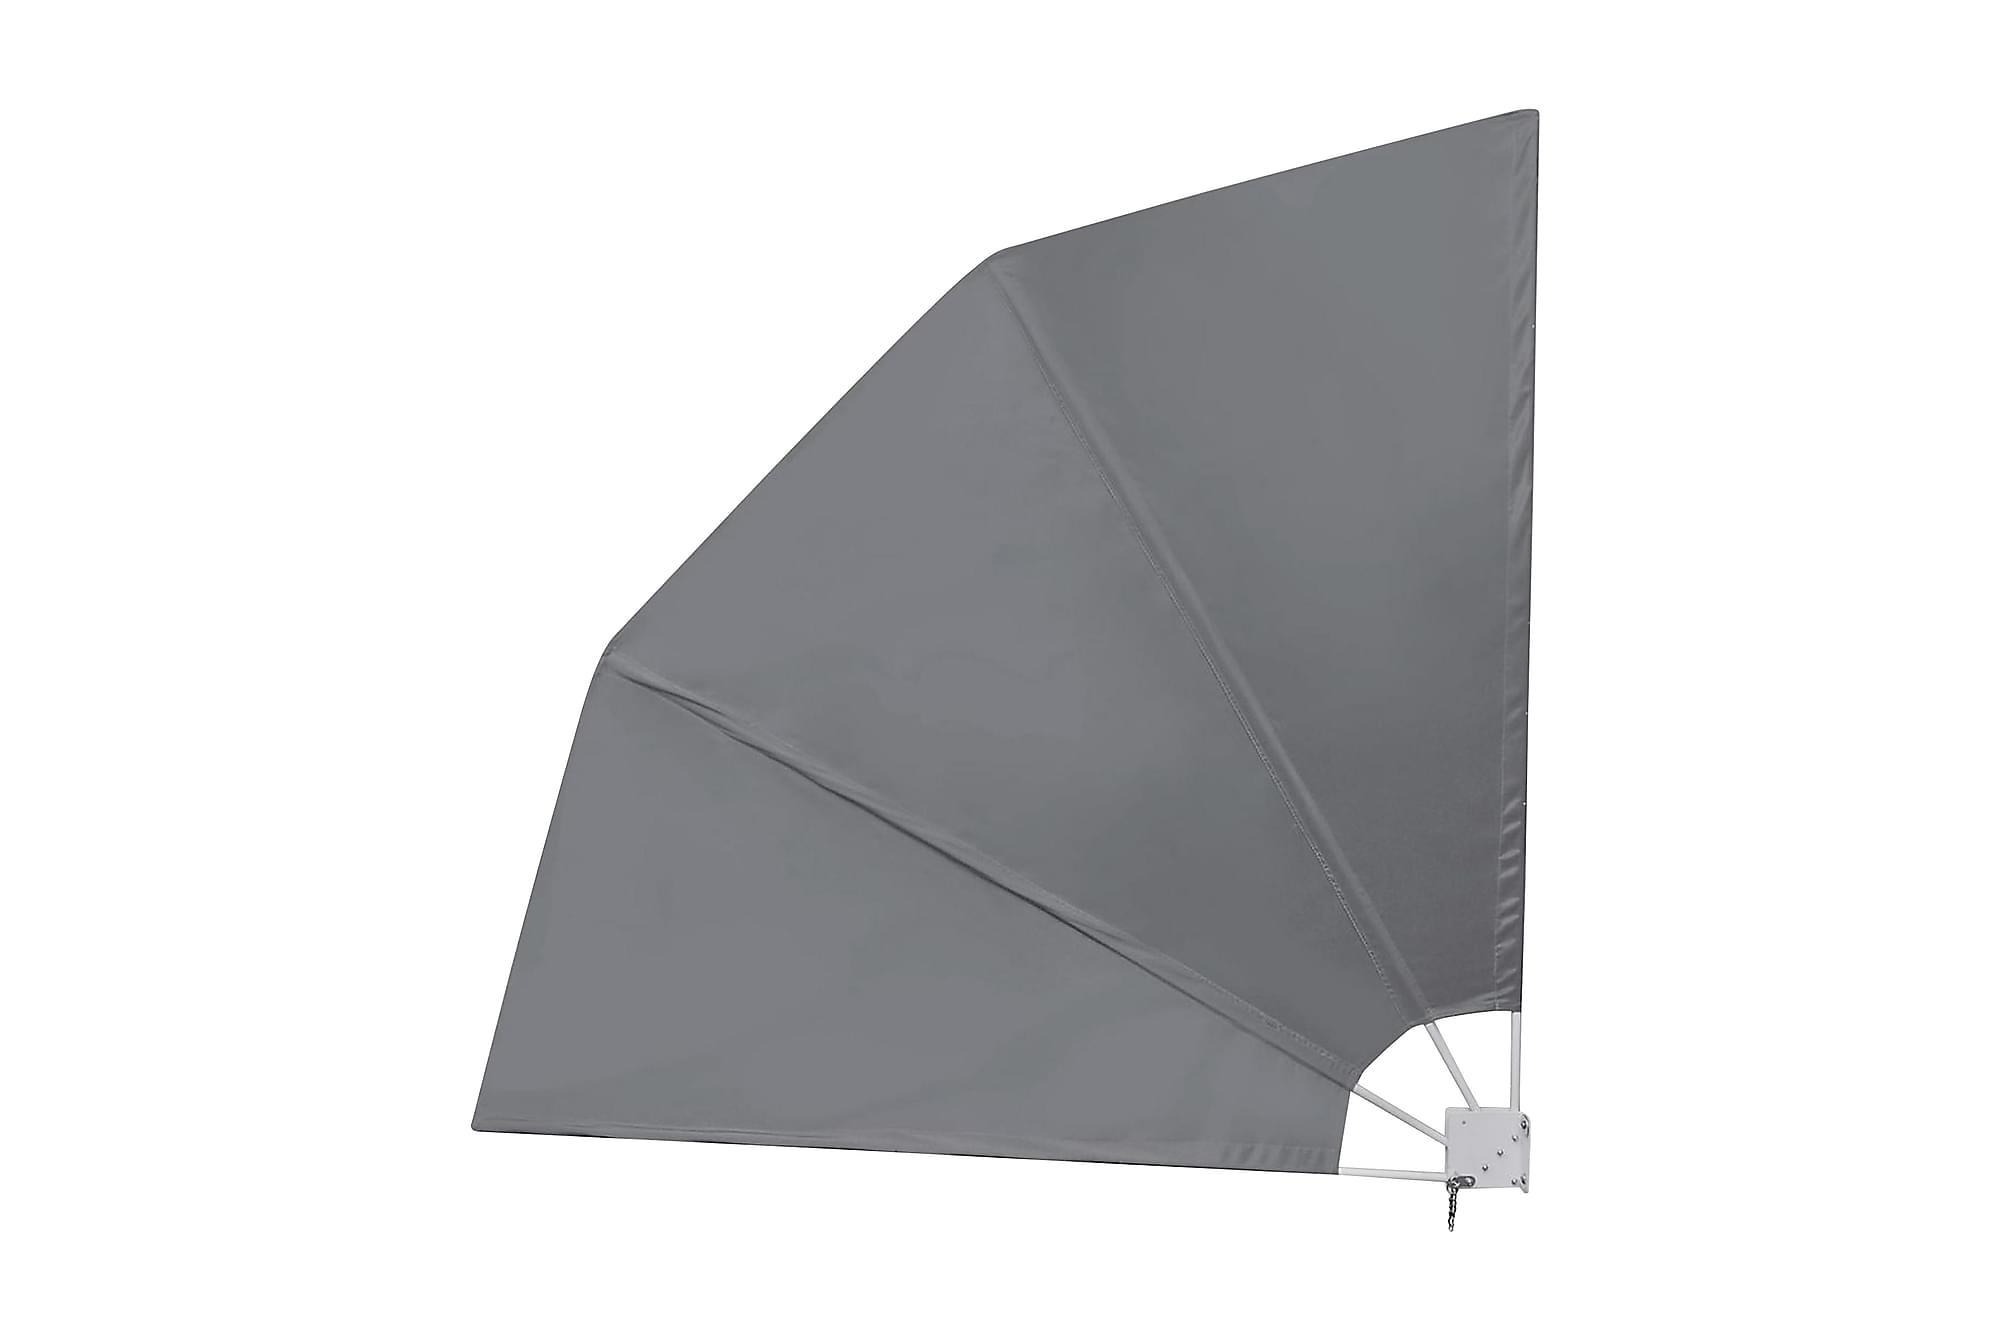 Sidomarkis för balkong grå 210x210 cm, Pergola